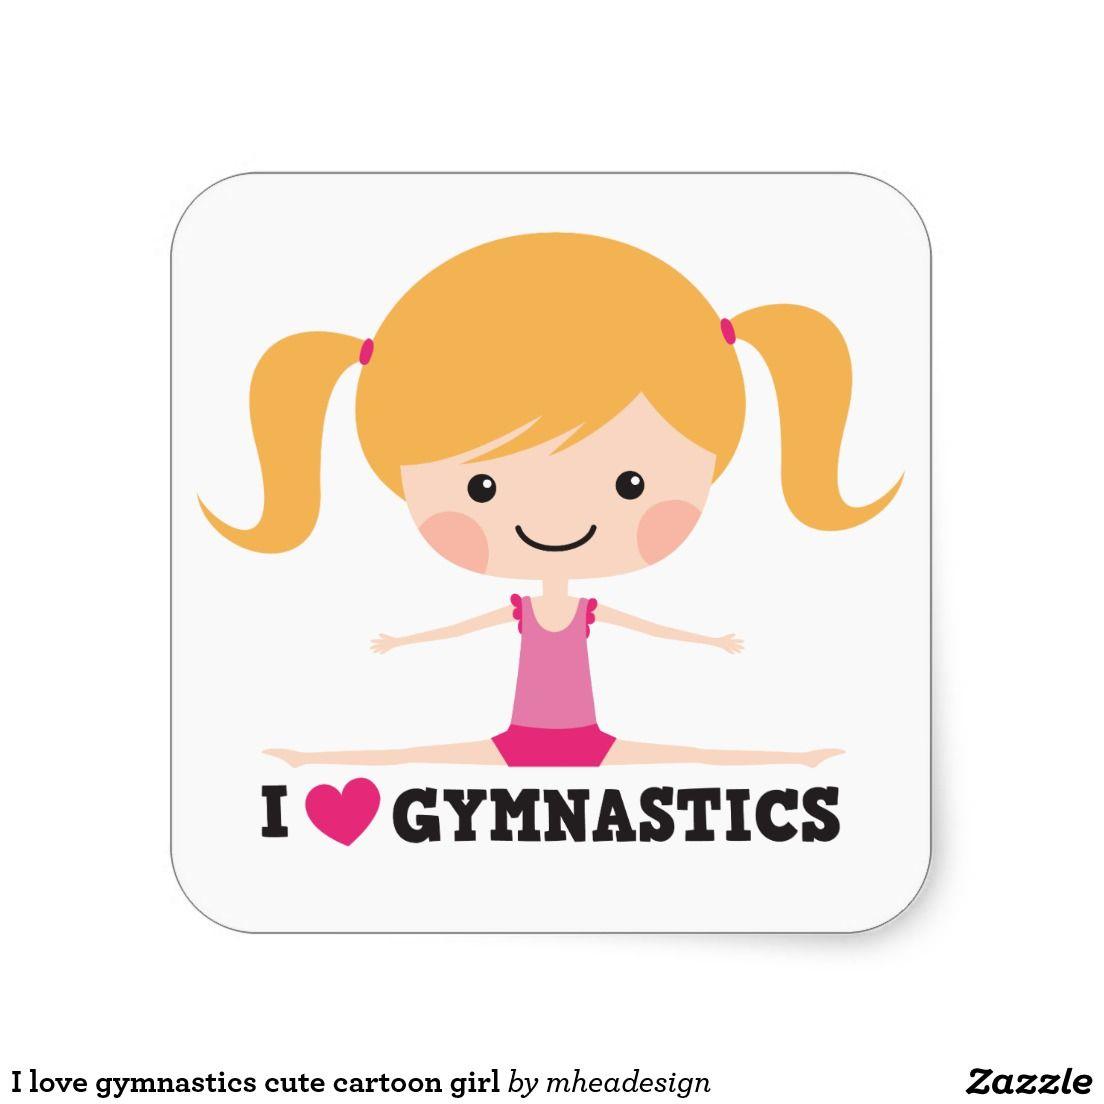 I love gymnastics cute cartoon girl square sticker  9c81f2557dc58